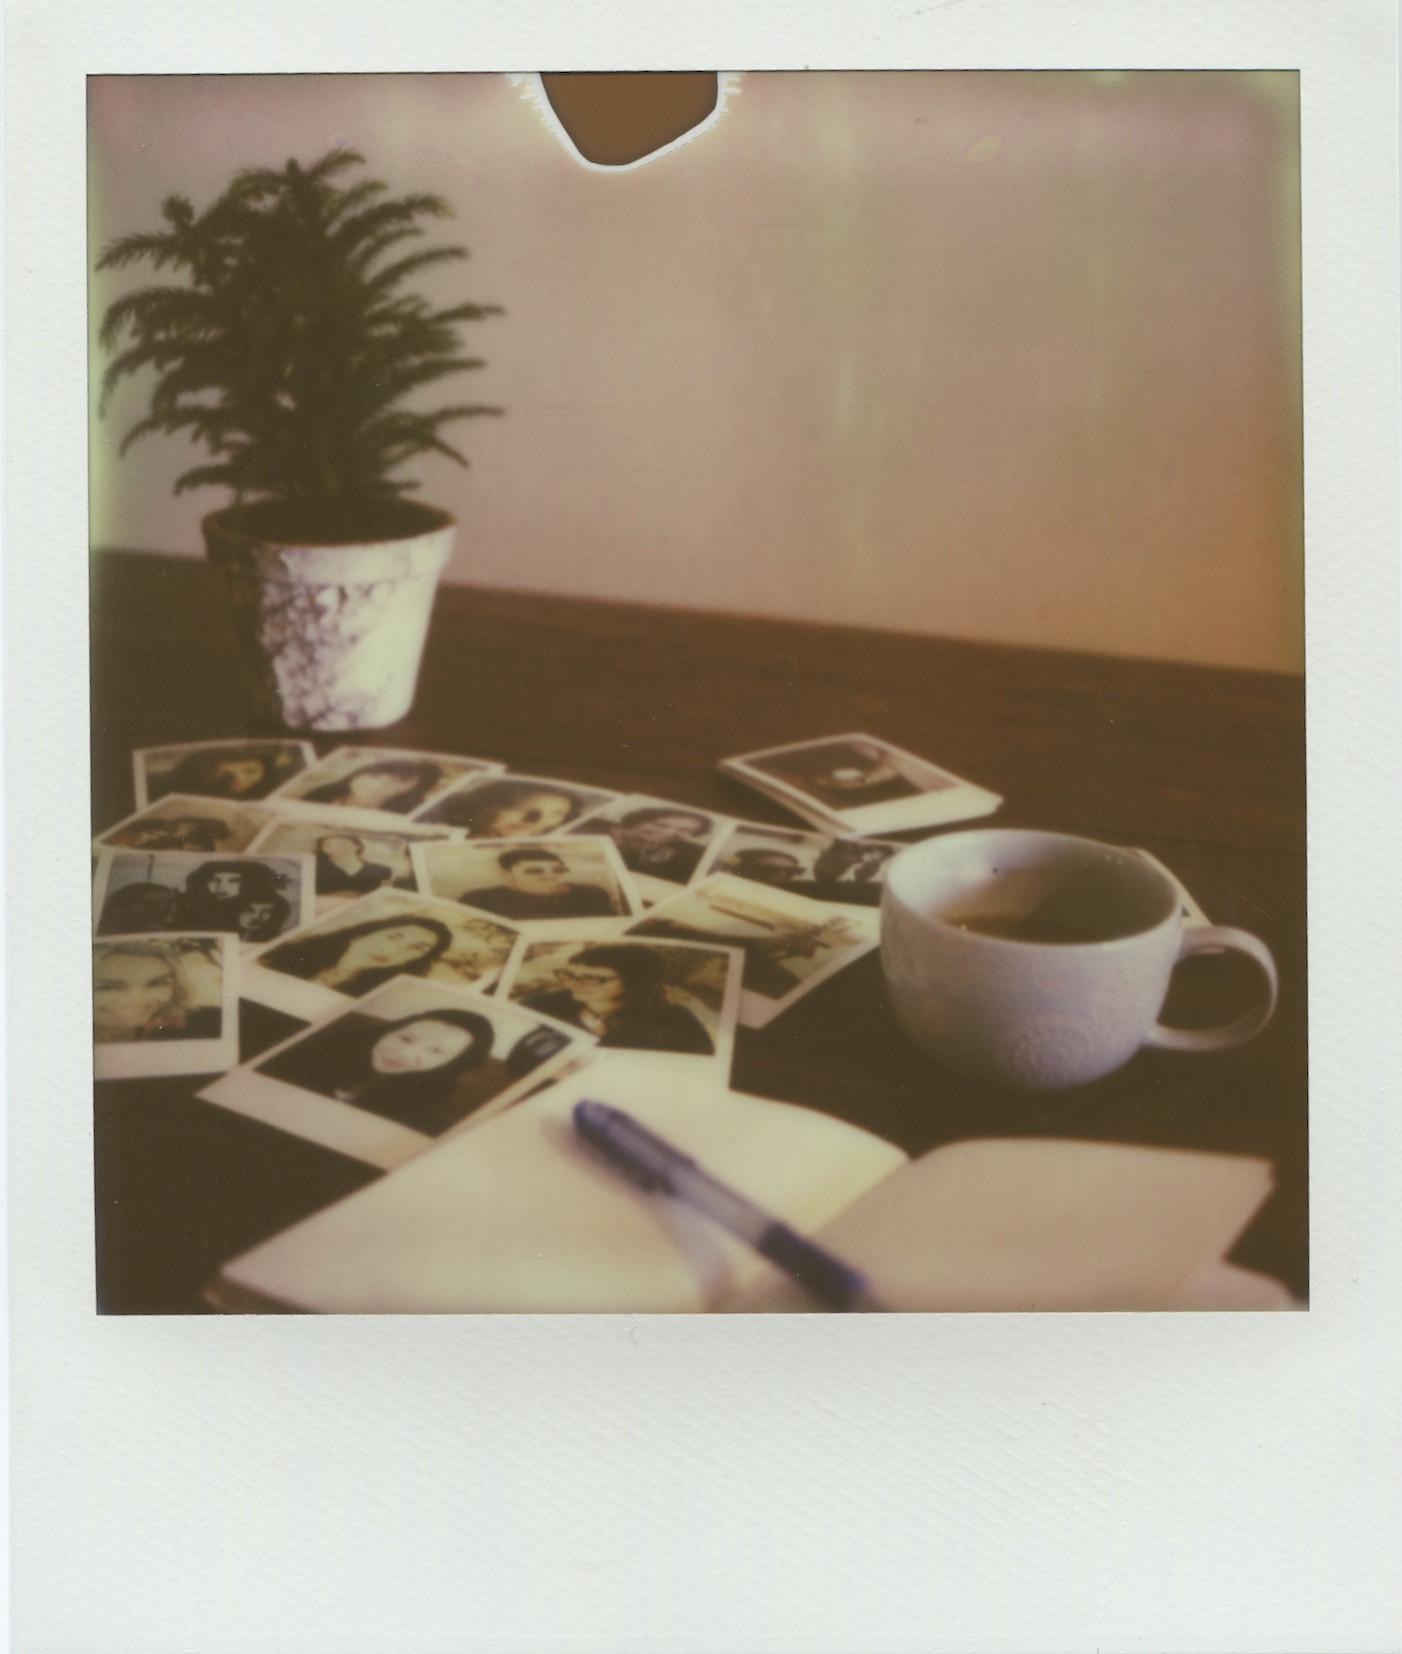 Polaroids portraits on a table